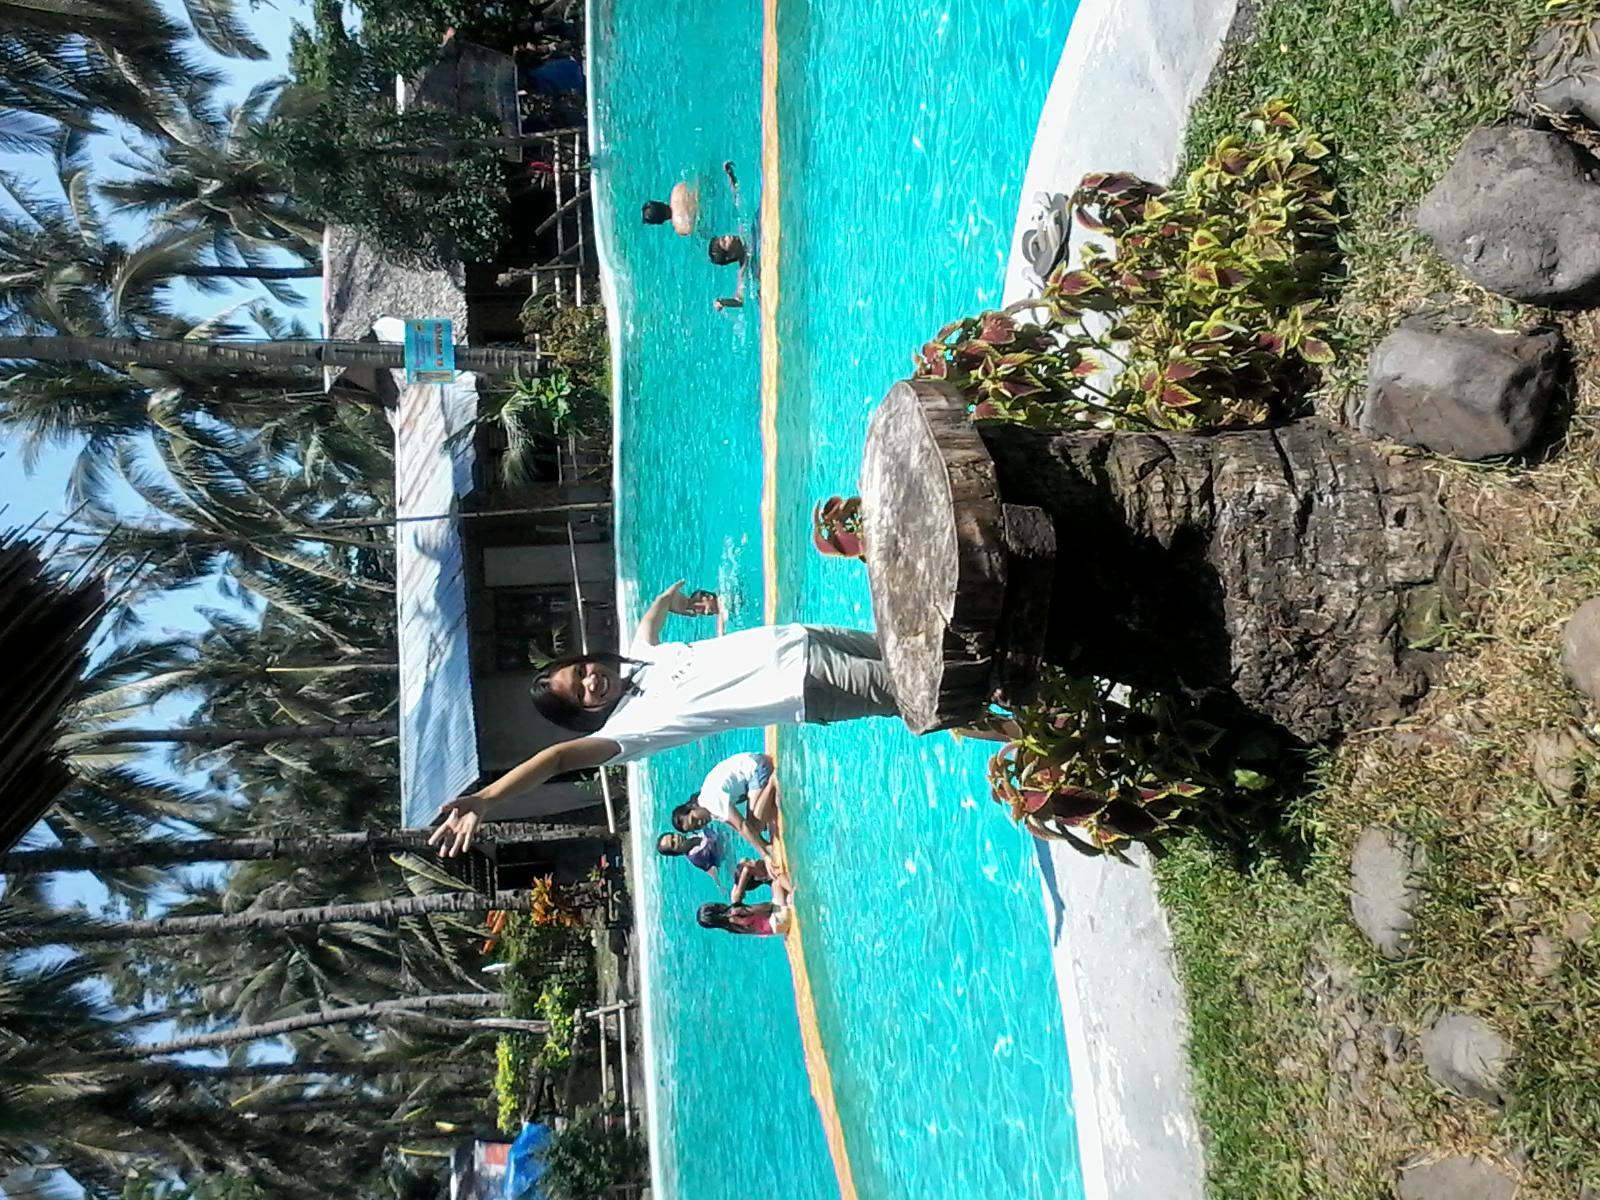 ELPRESCO RESORT,BUNGA BAYBAY CITY - Cover